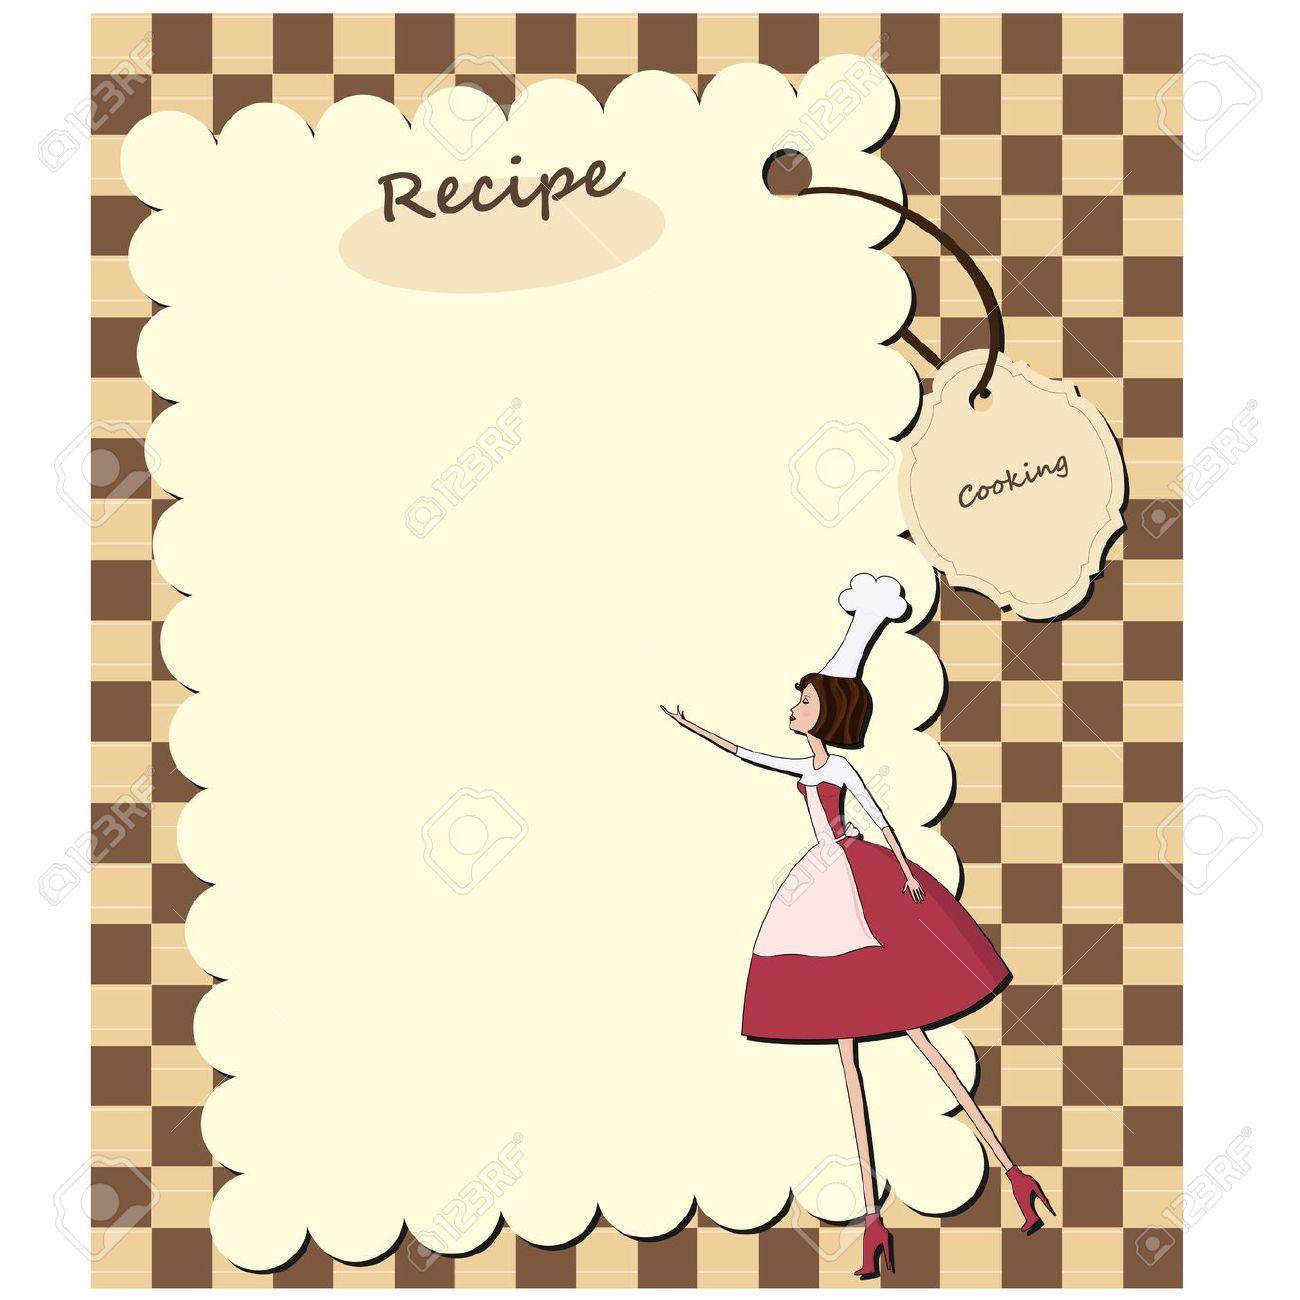 Recipe Clip Art Free